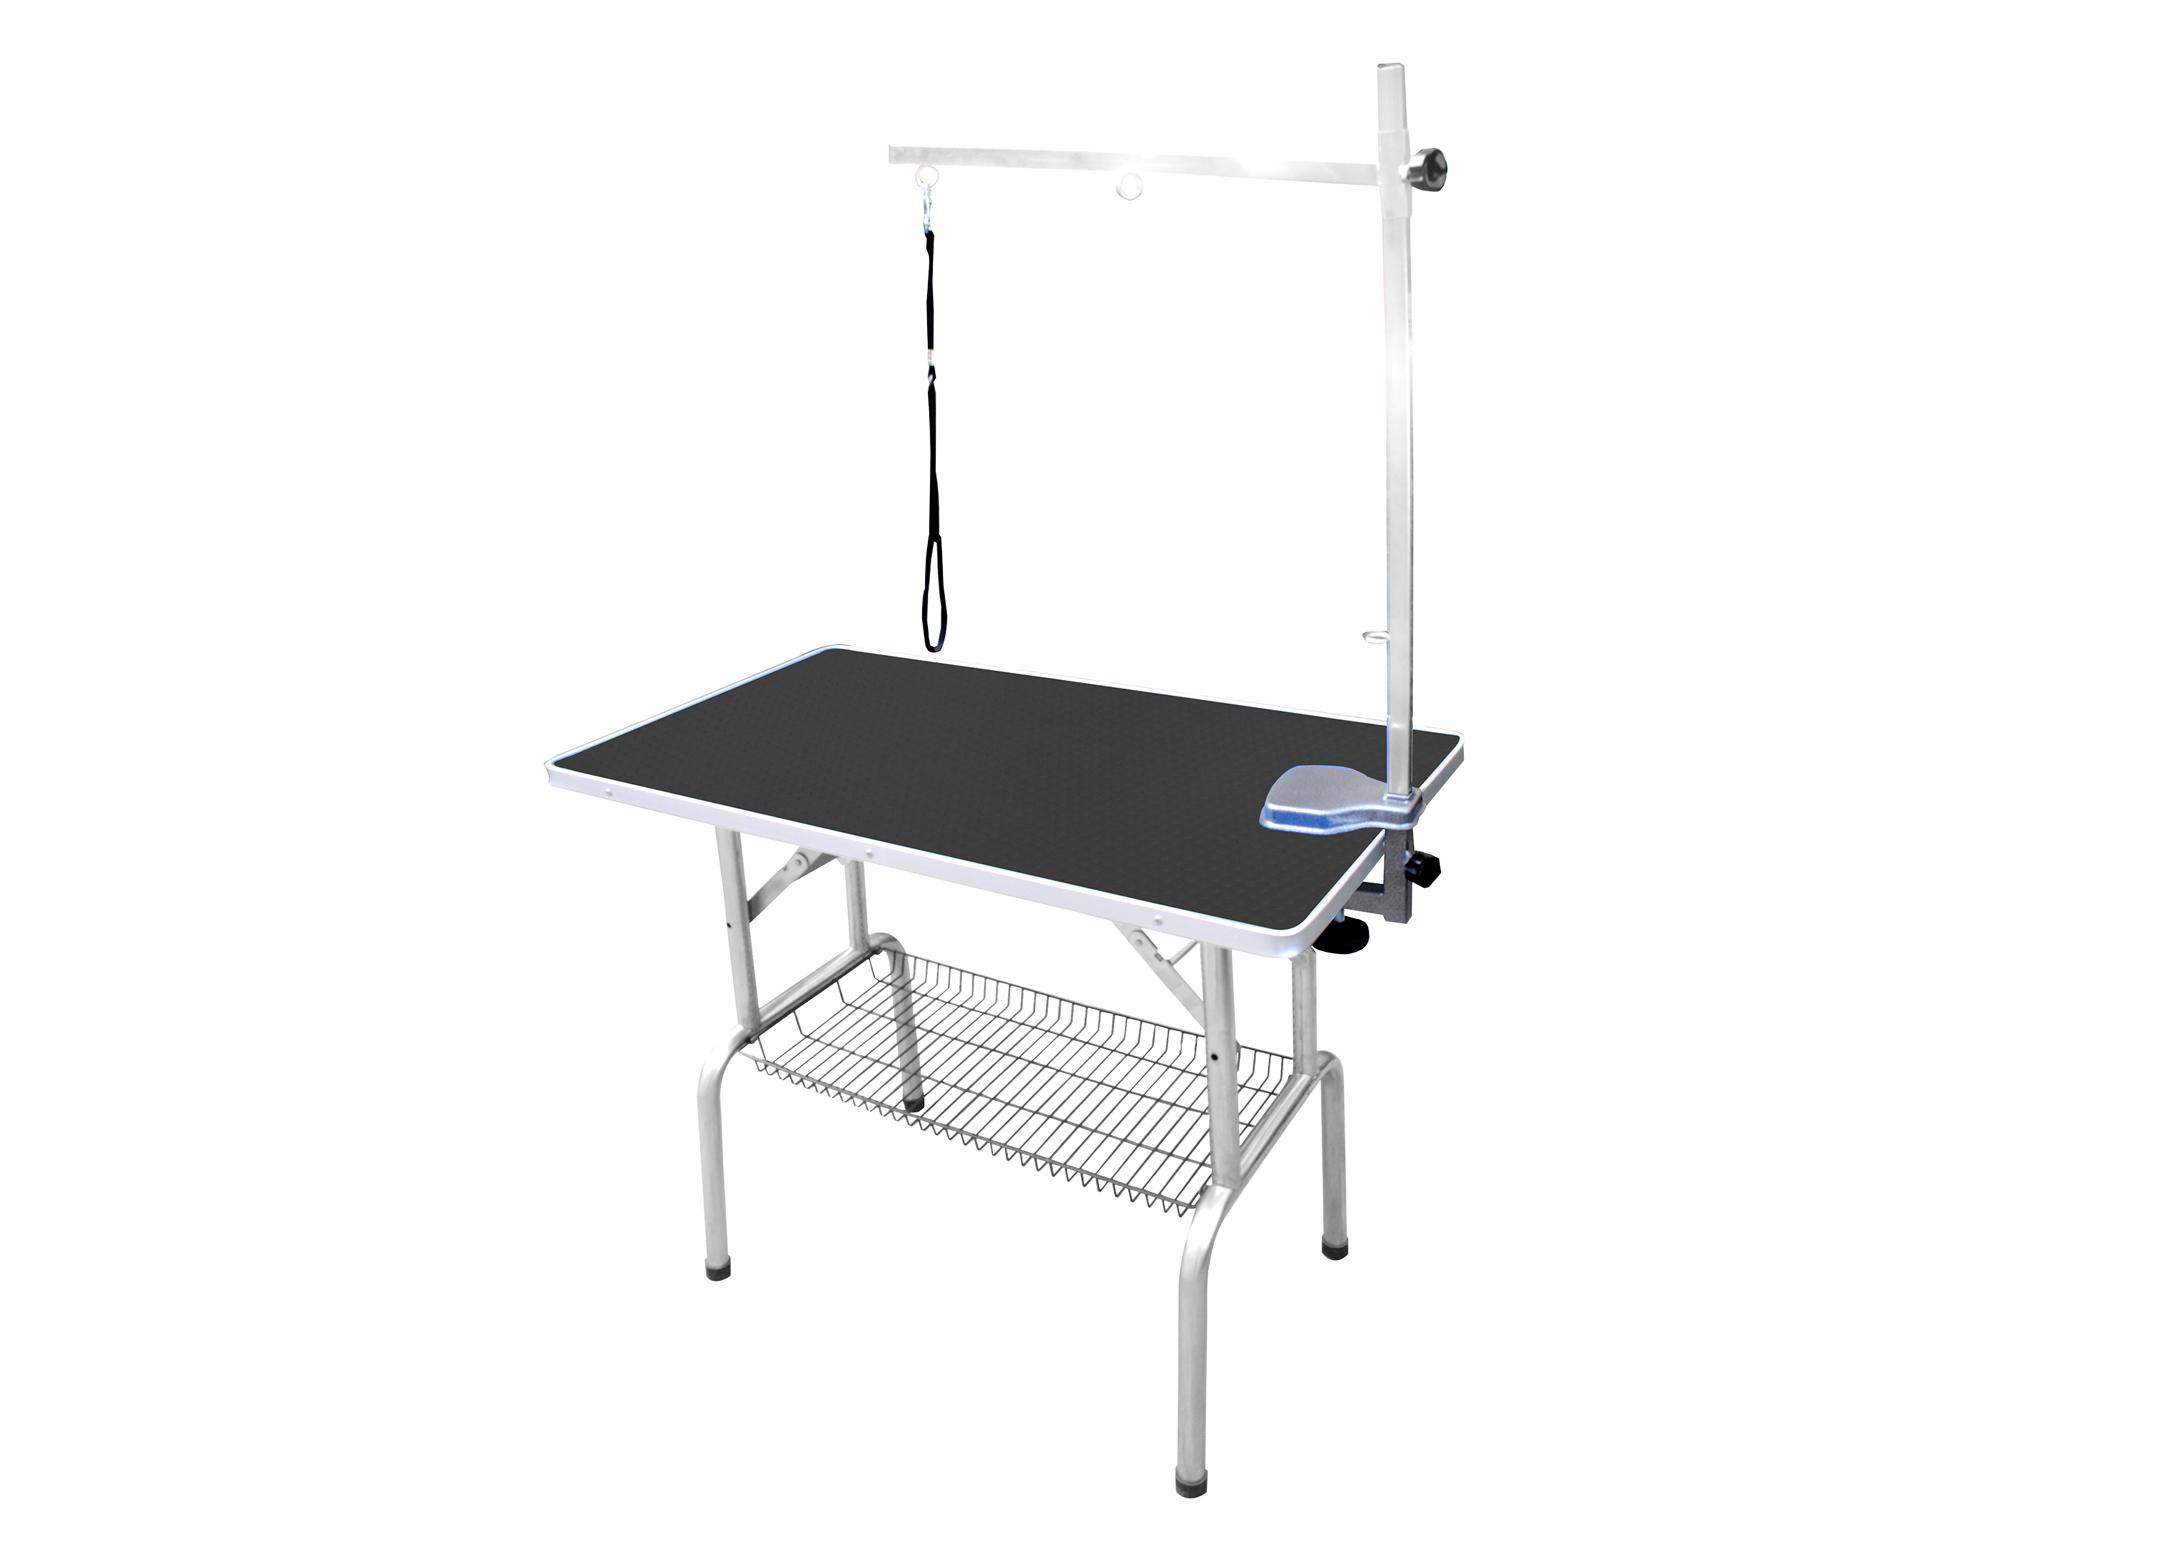 SS Grooming Table 95x55x78cmH Show Table